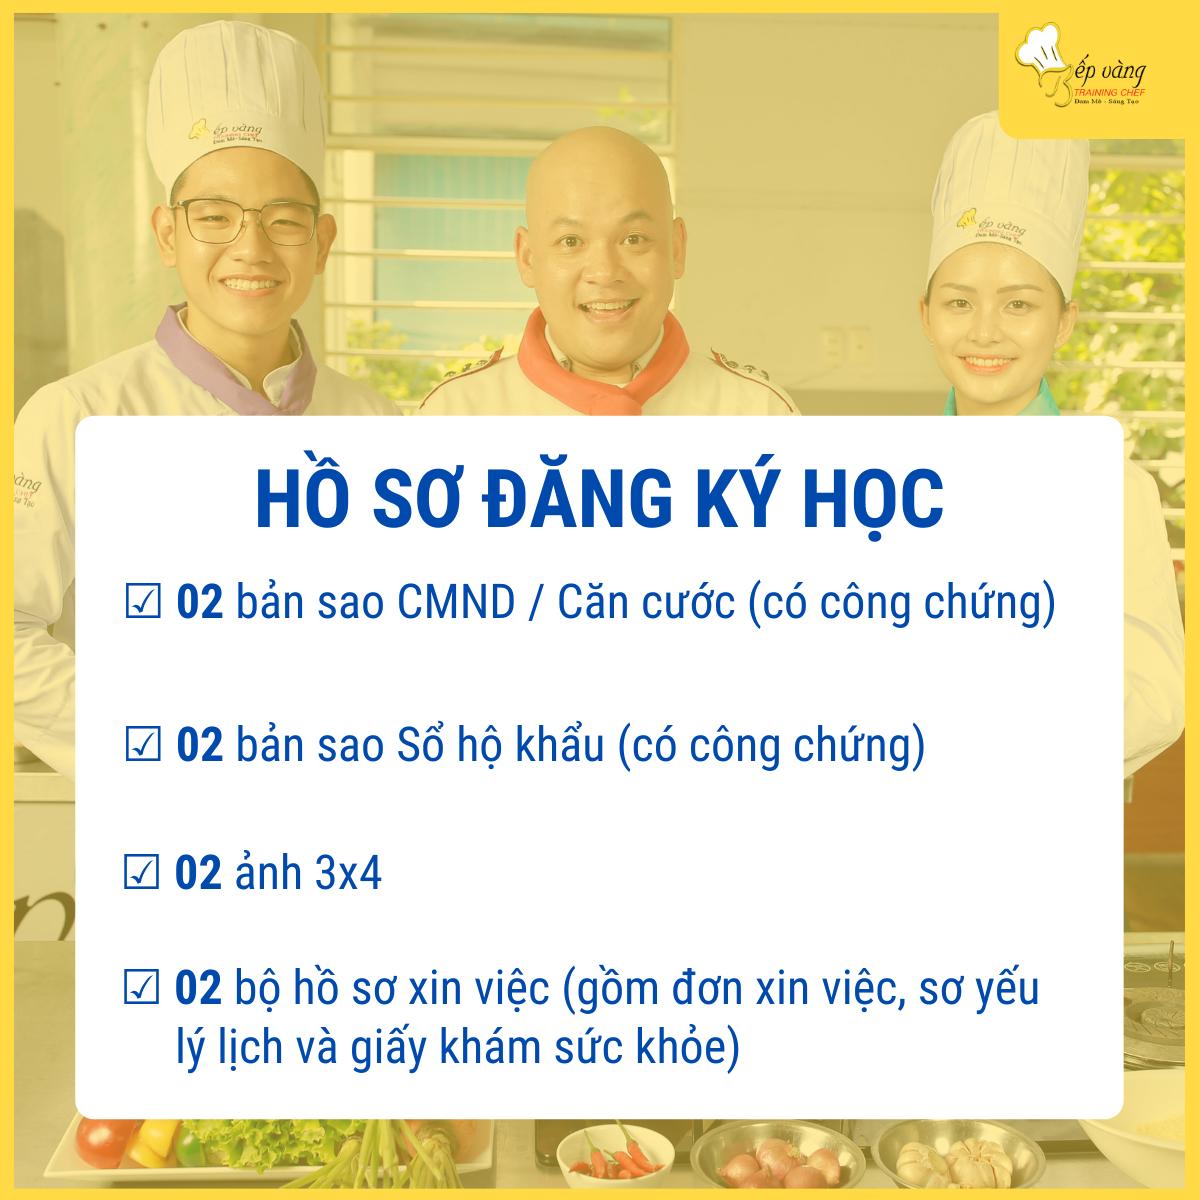 ho-so-dang-ky-hoc-nghe-bep-dao-tao-bep-vang